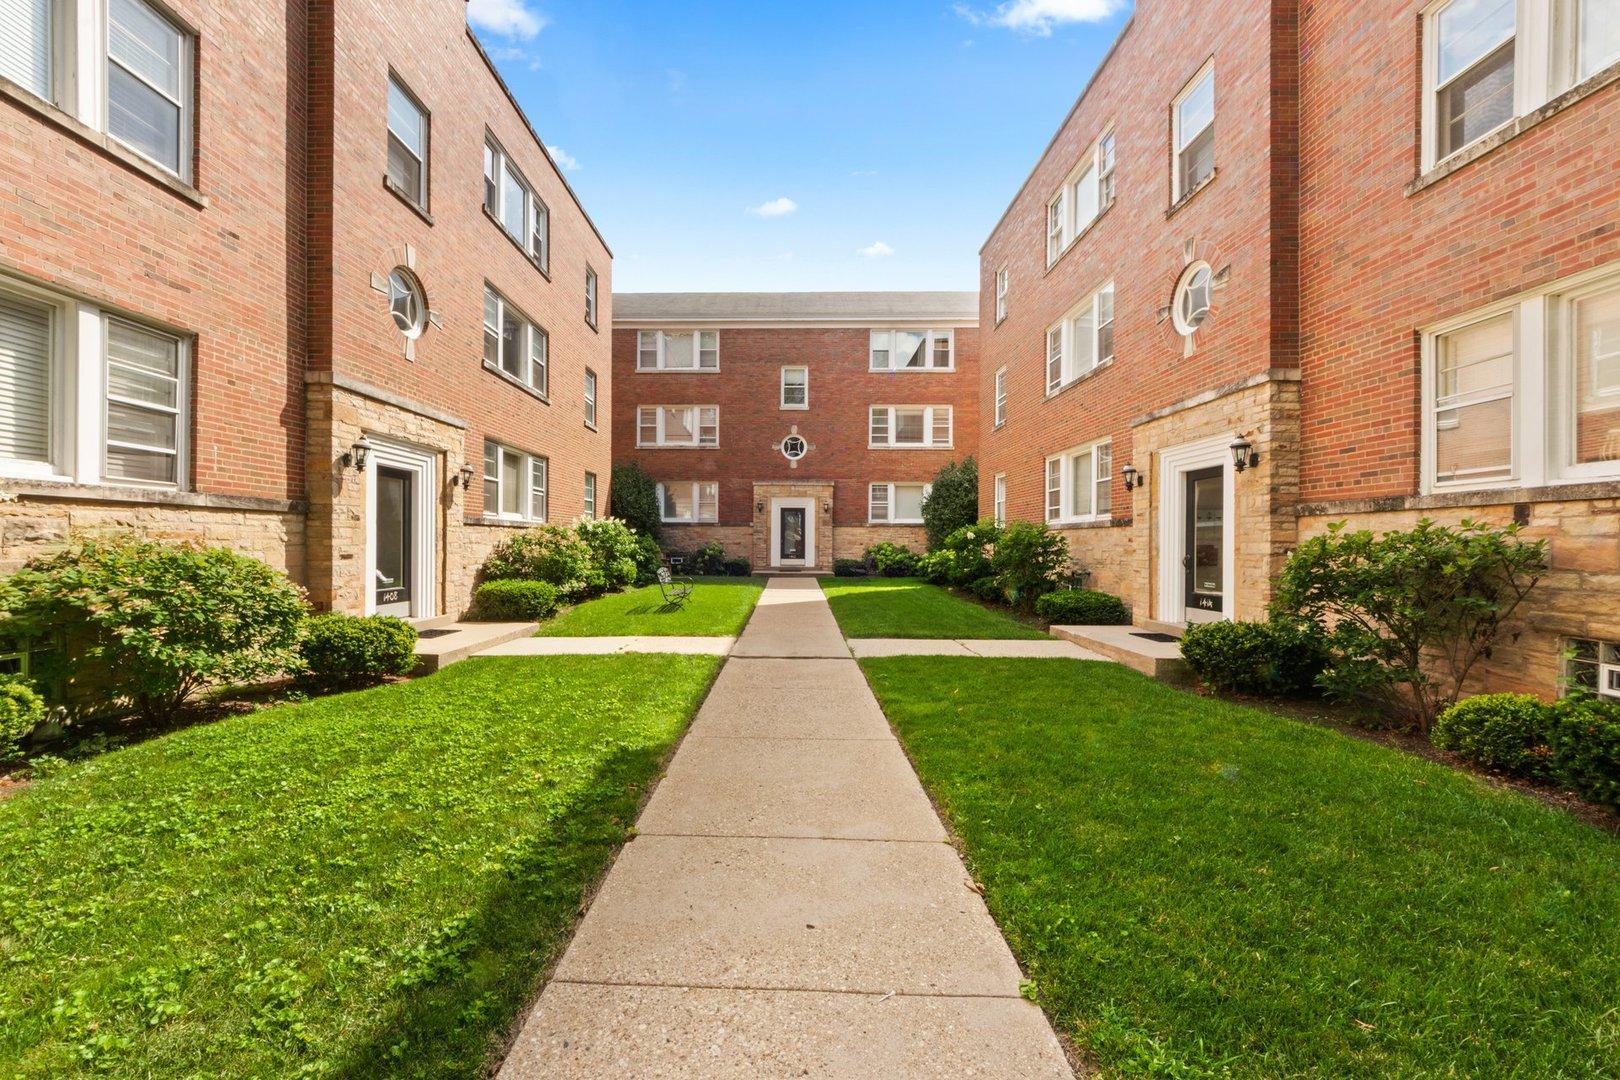 1408 Central Street Unit 3N, Evanston IL 60201